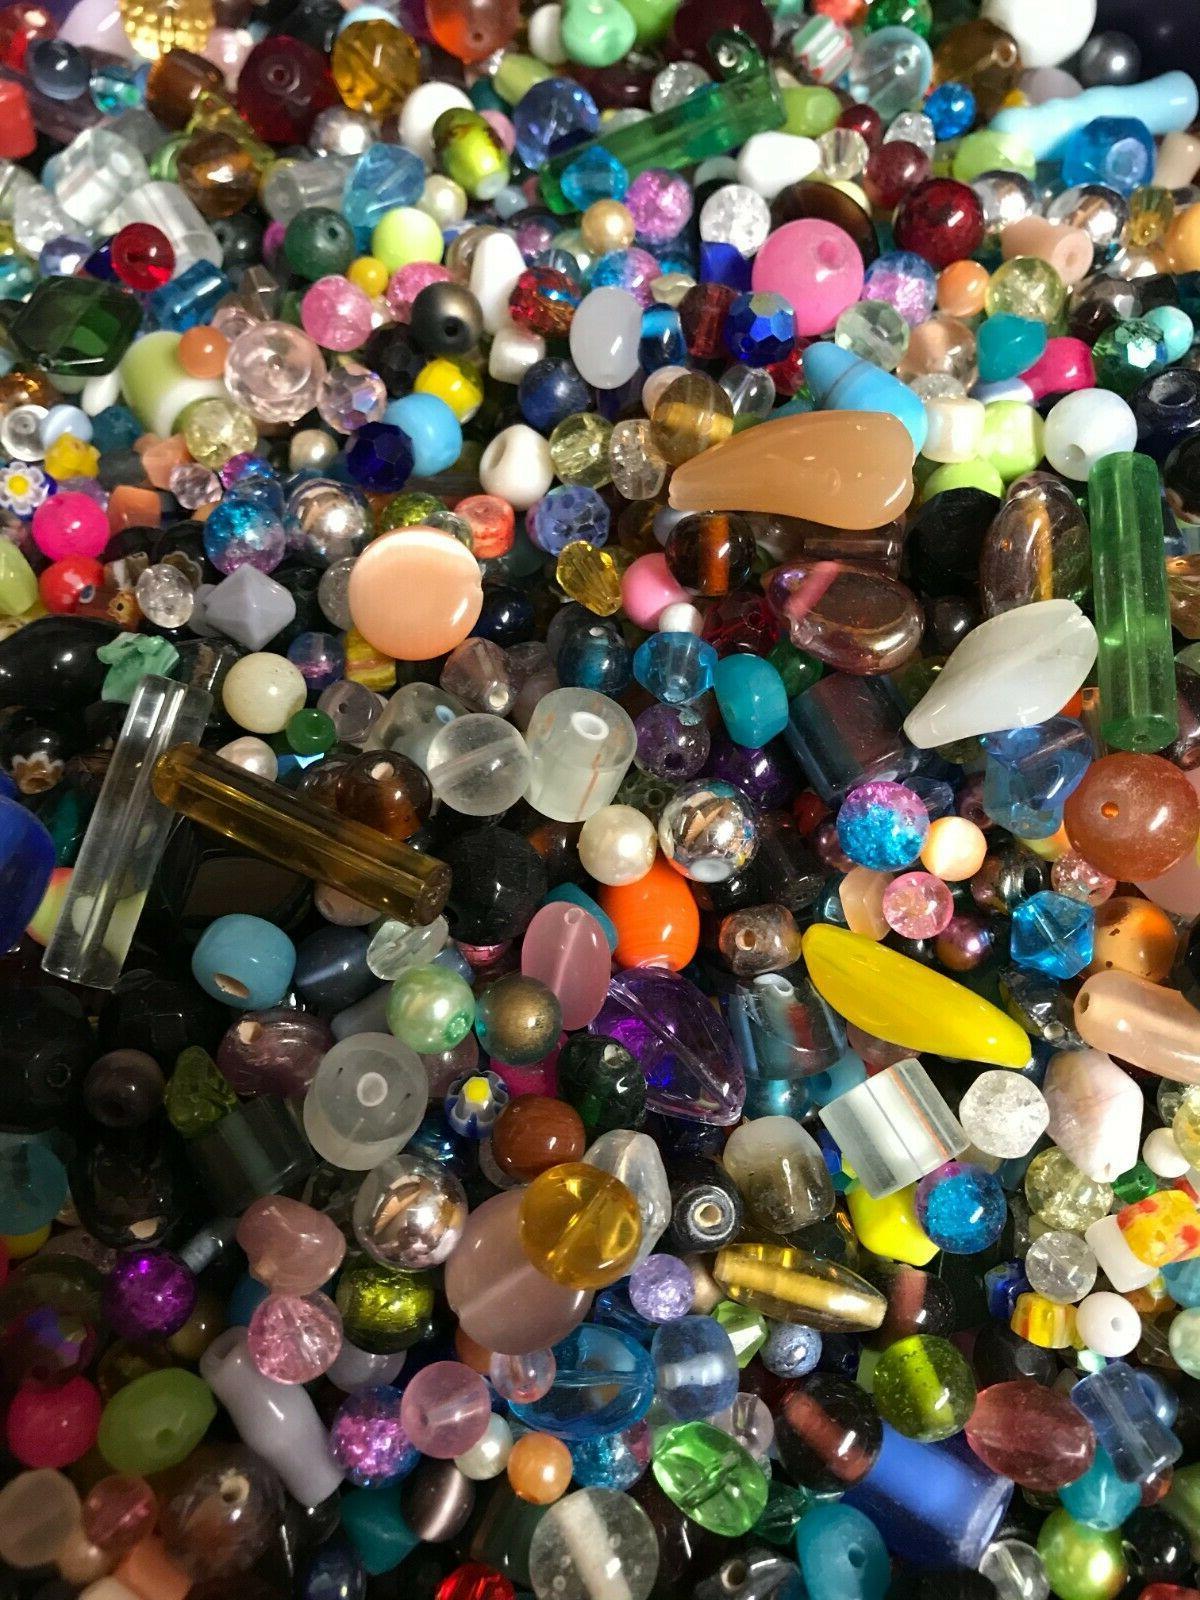 ~100~ Glass Beads Bulk Mixed Craft Grab Gift*